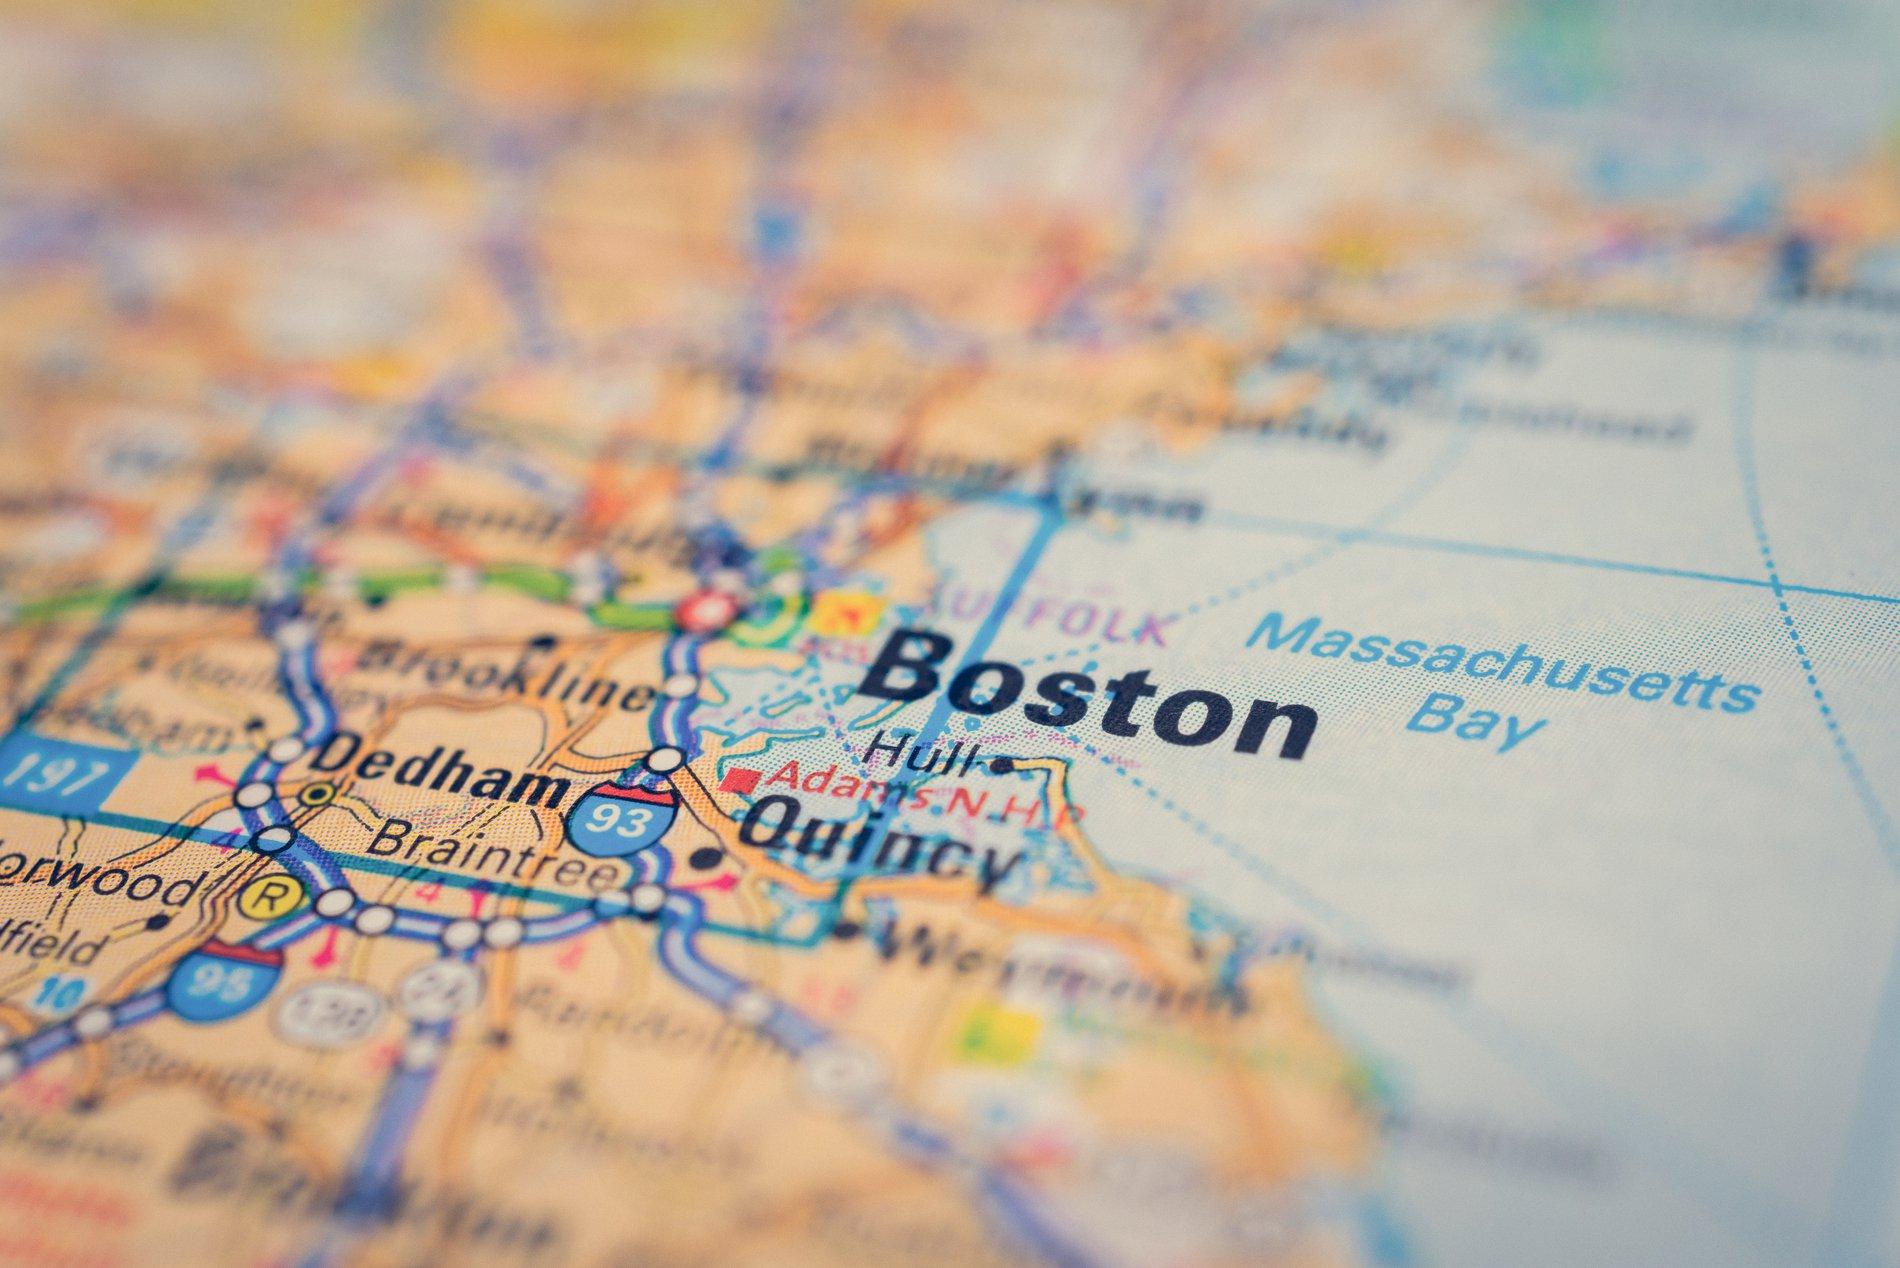 Massachusetts Halts 5 ICOs on 'Unregistered Securities' Grounds